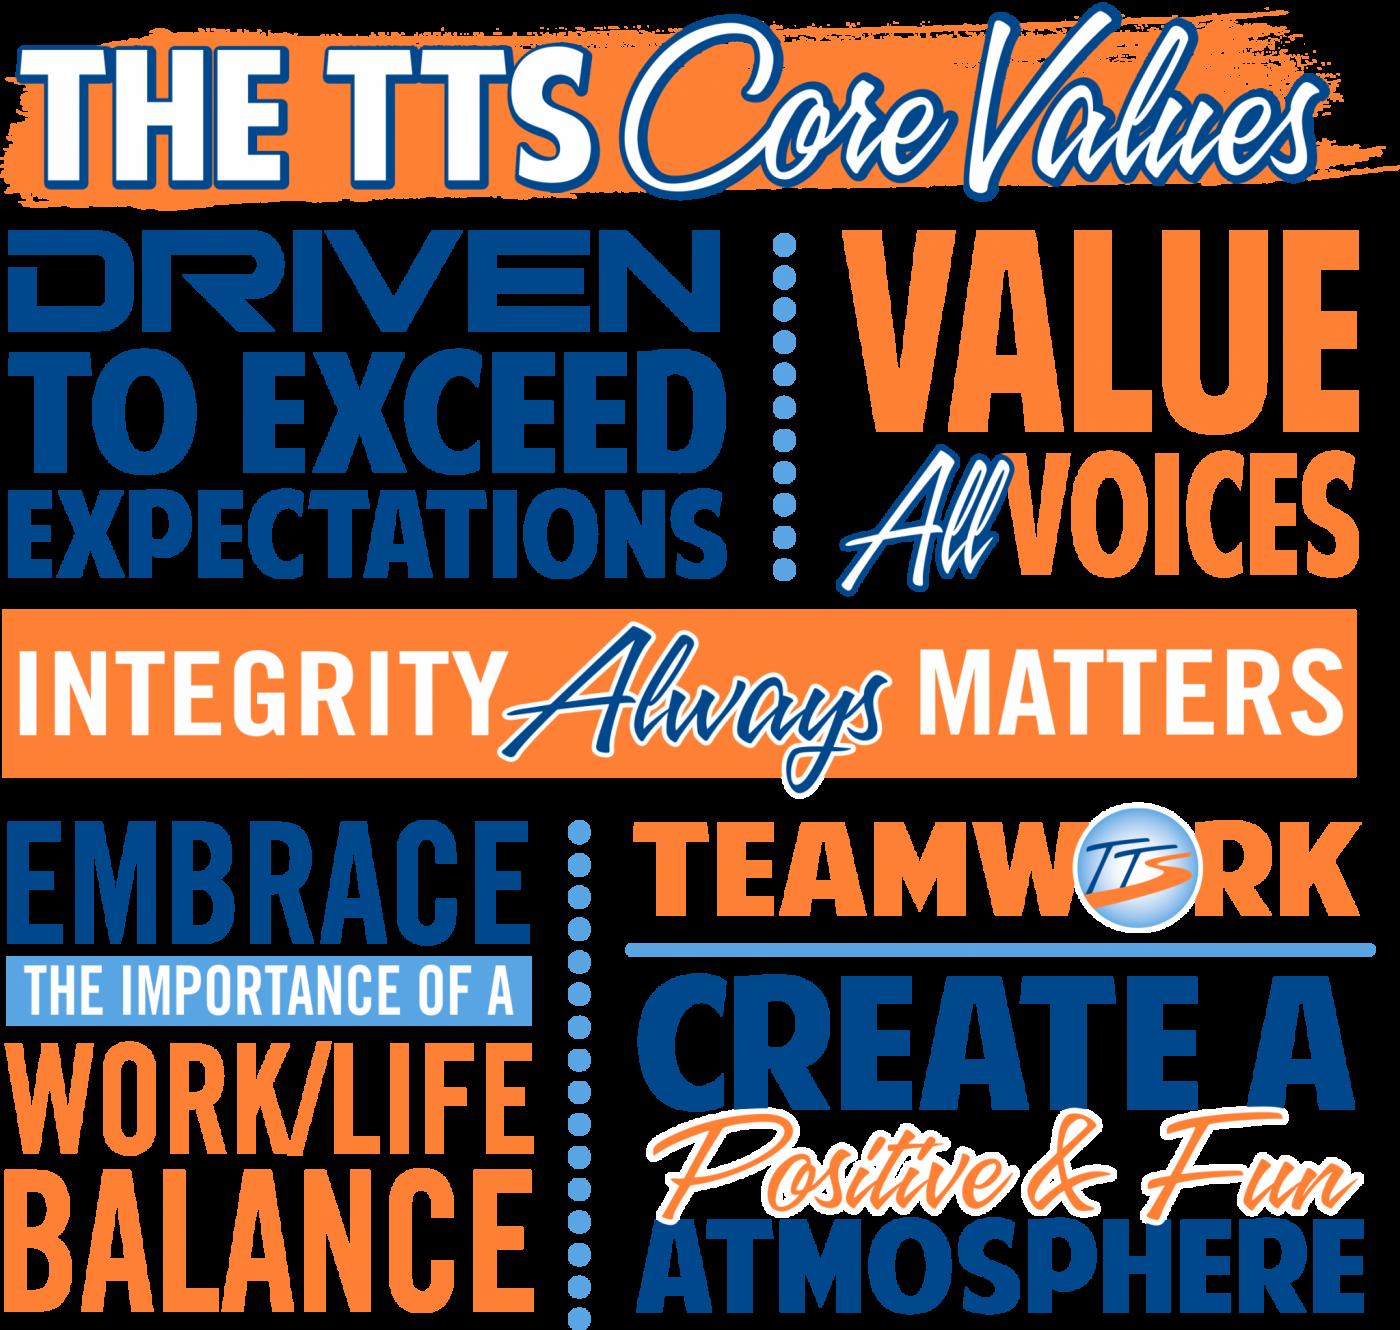 TTS Core Values